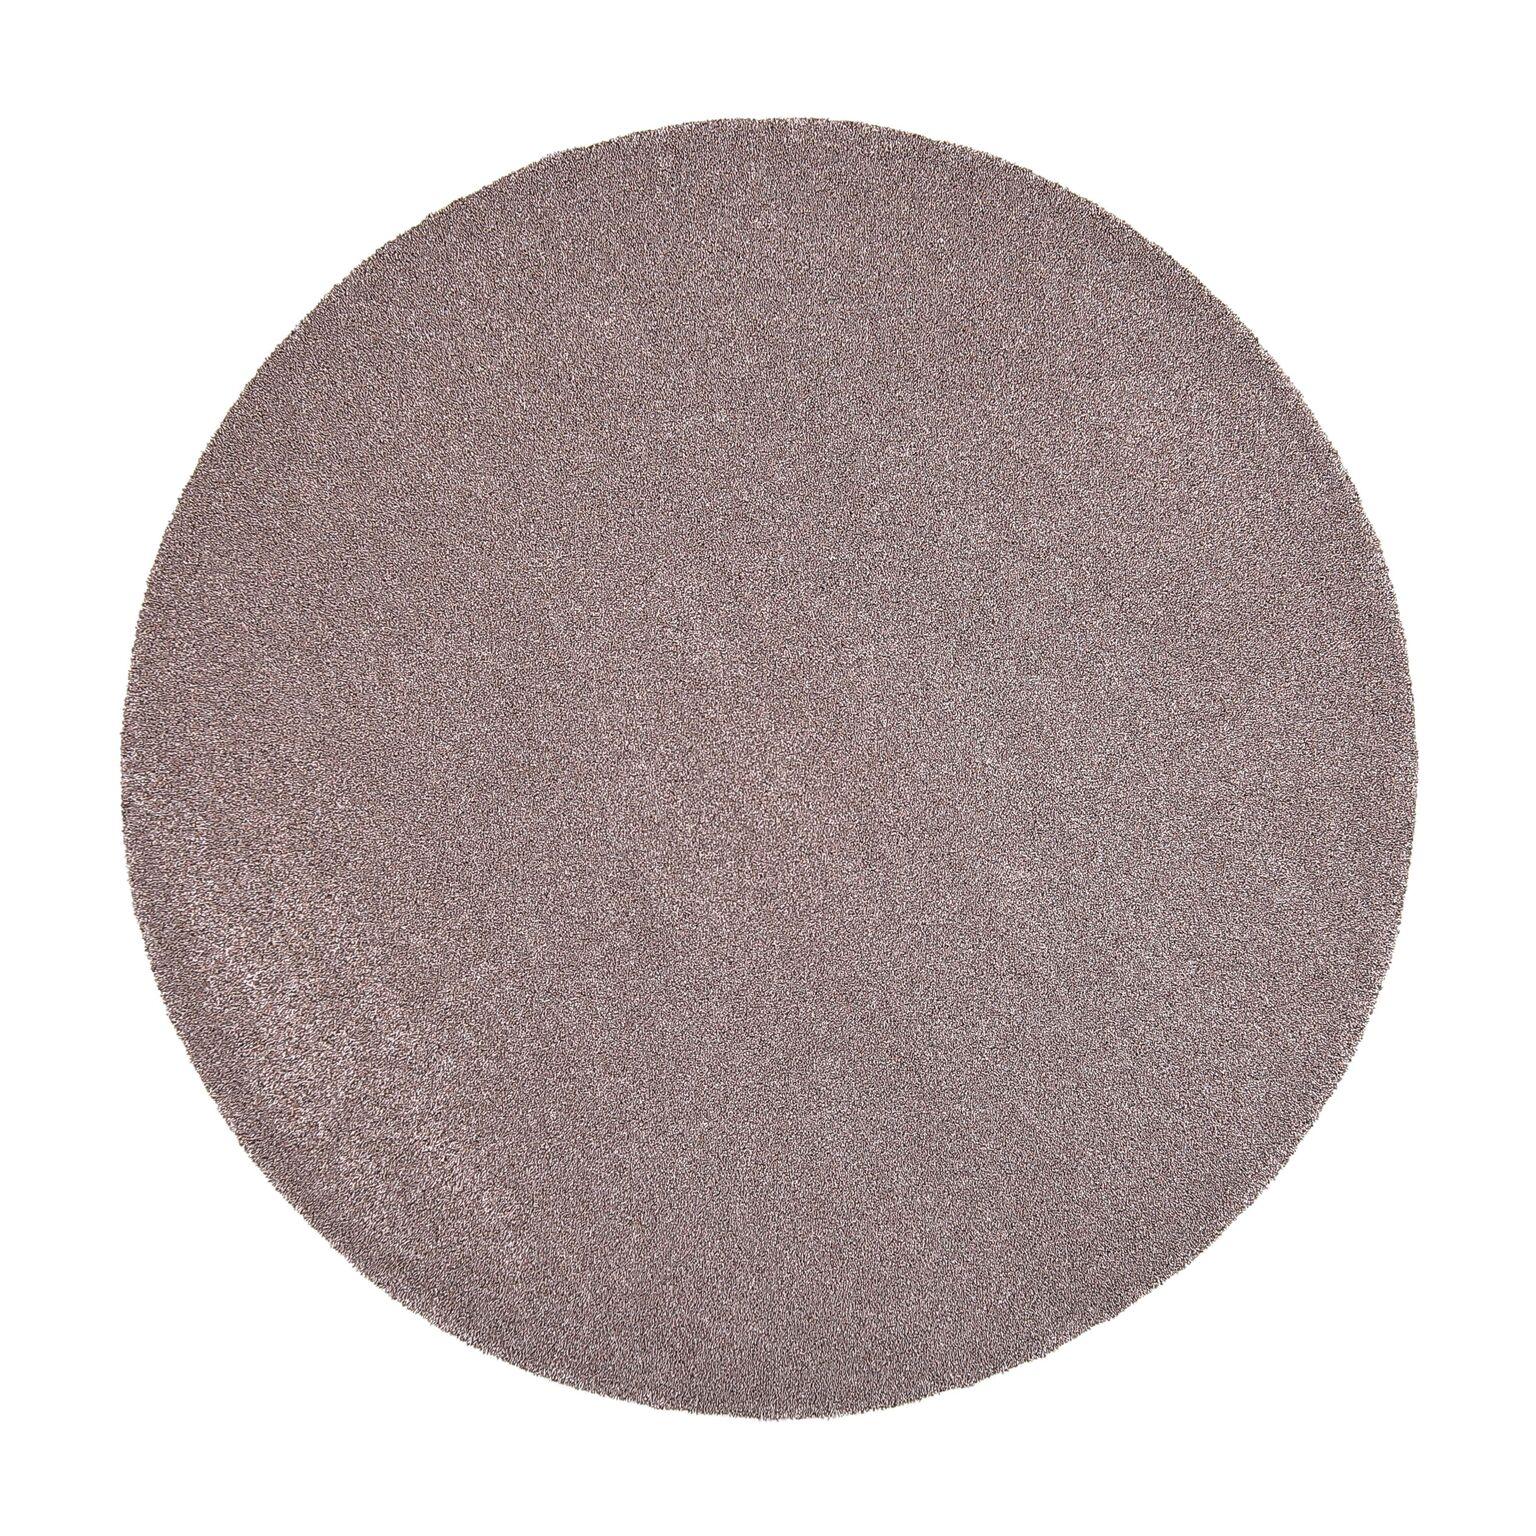 VM Carpet pyöreä Kide matto 94 ruskea